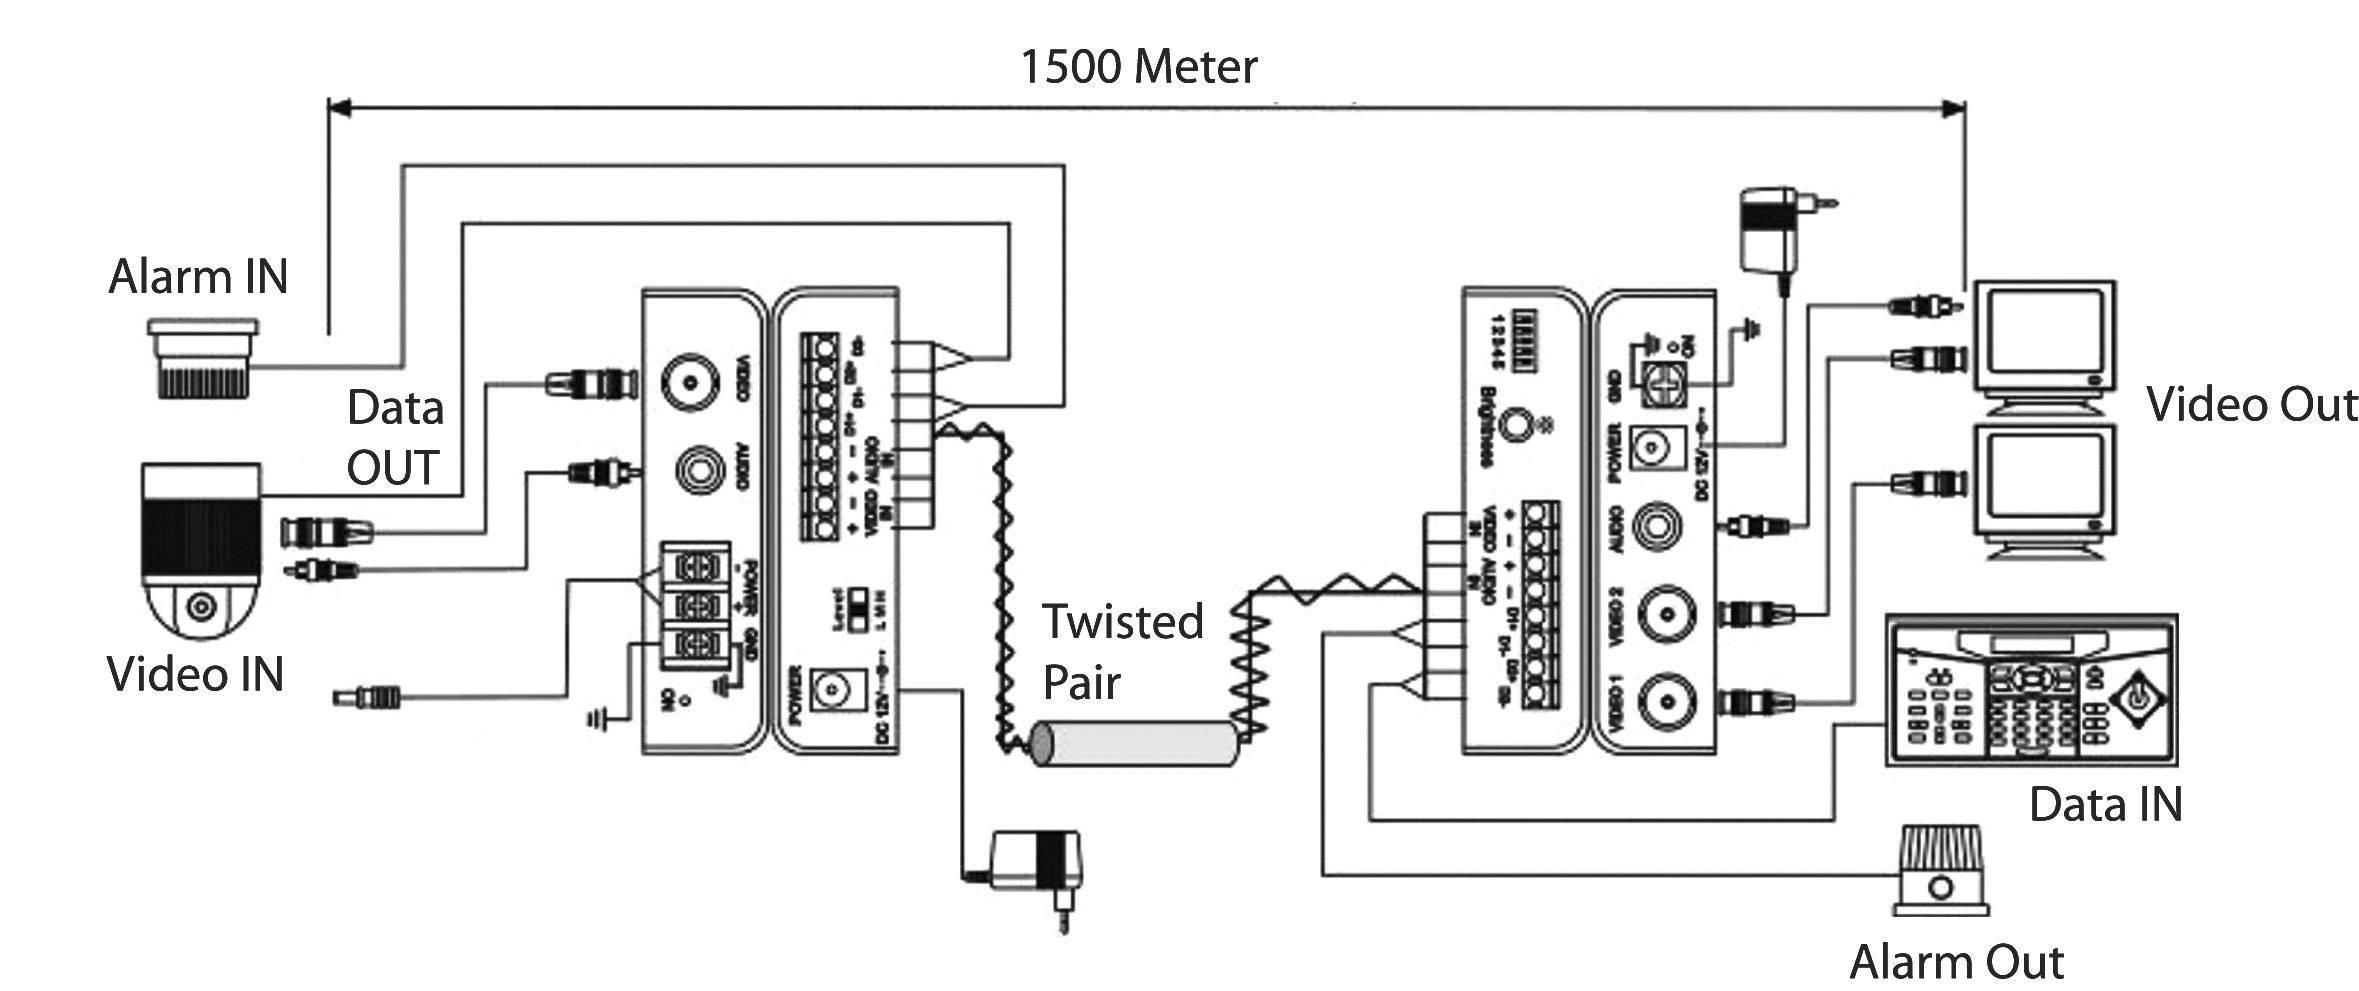 abus wiring diagram wiring diagrams scematic abus hoist parts abus crane electrical diagram [ 2359 x 991 Pixel ]